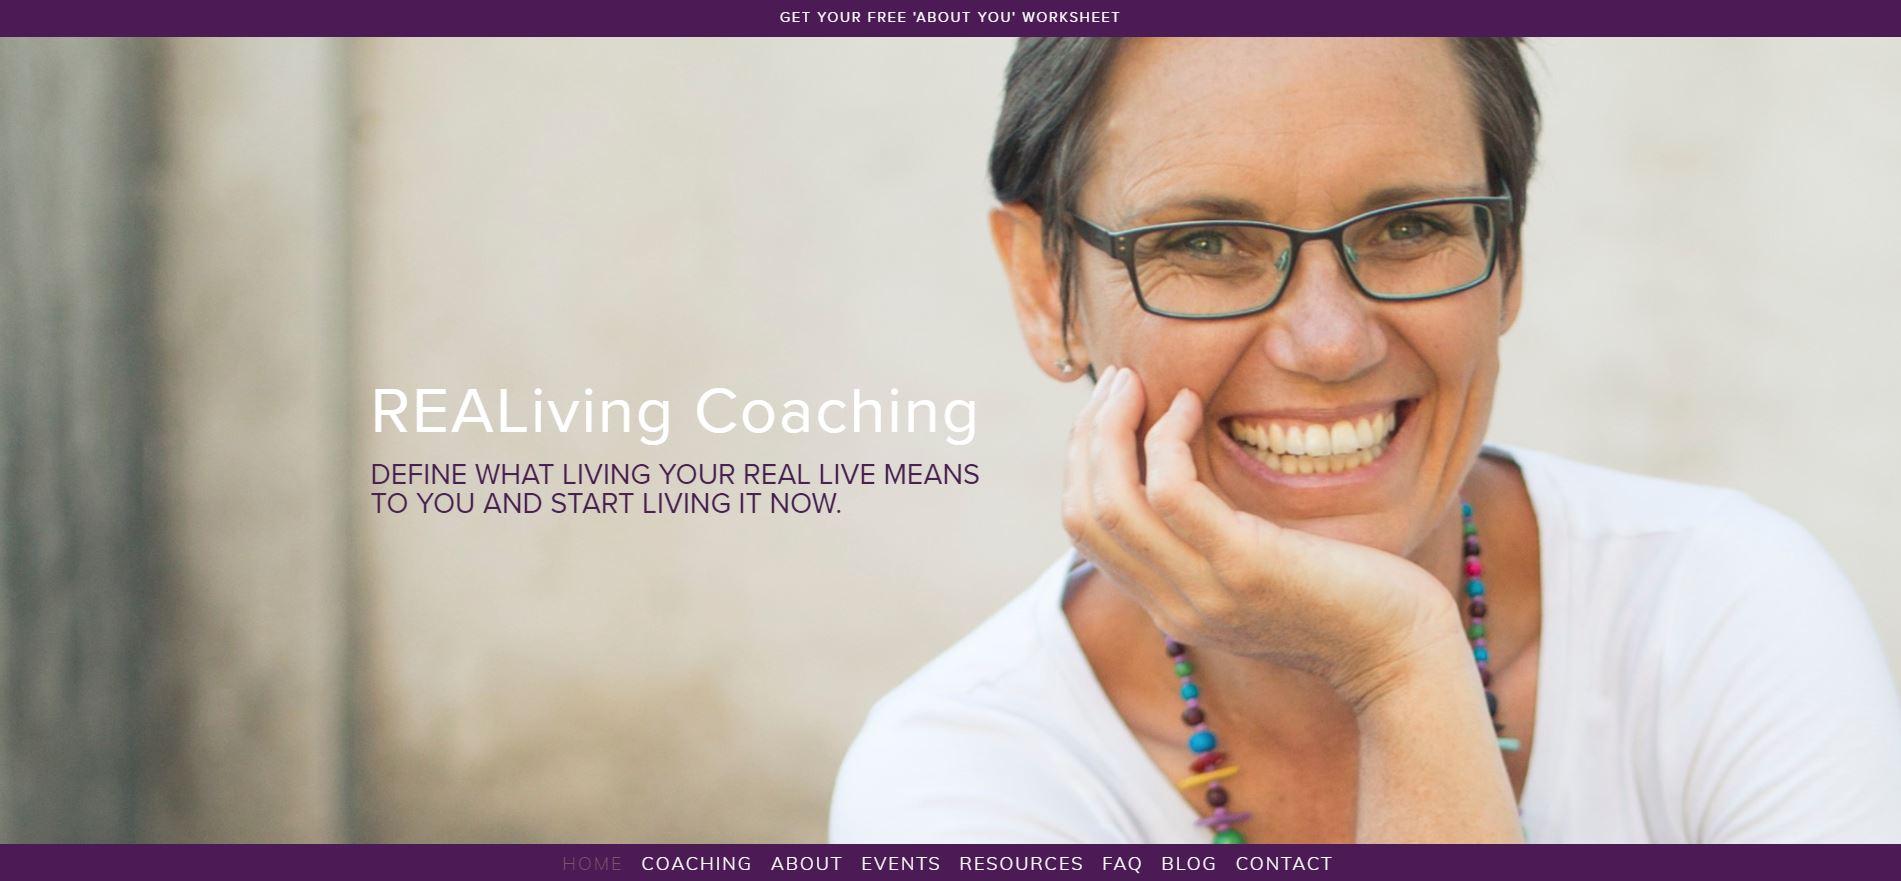 REALiving Coaching